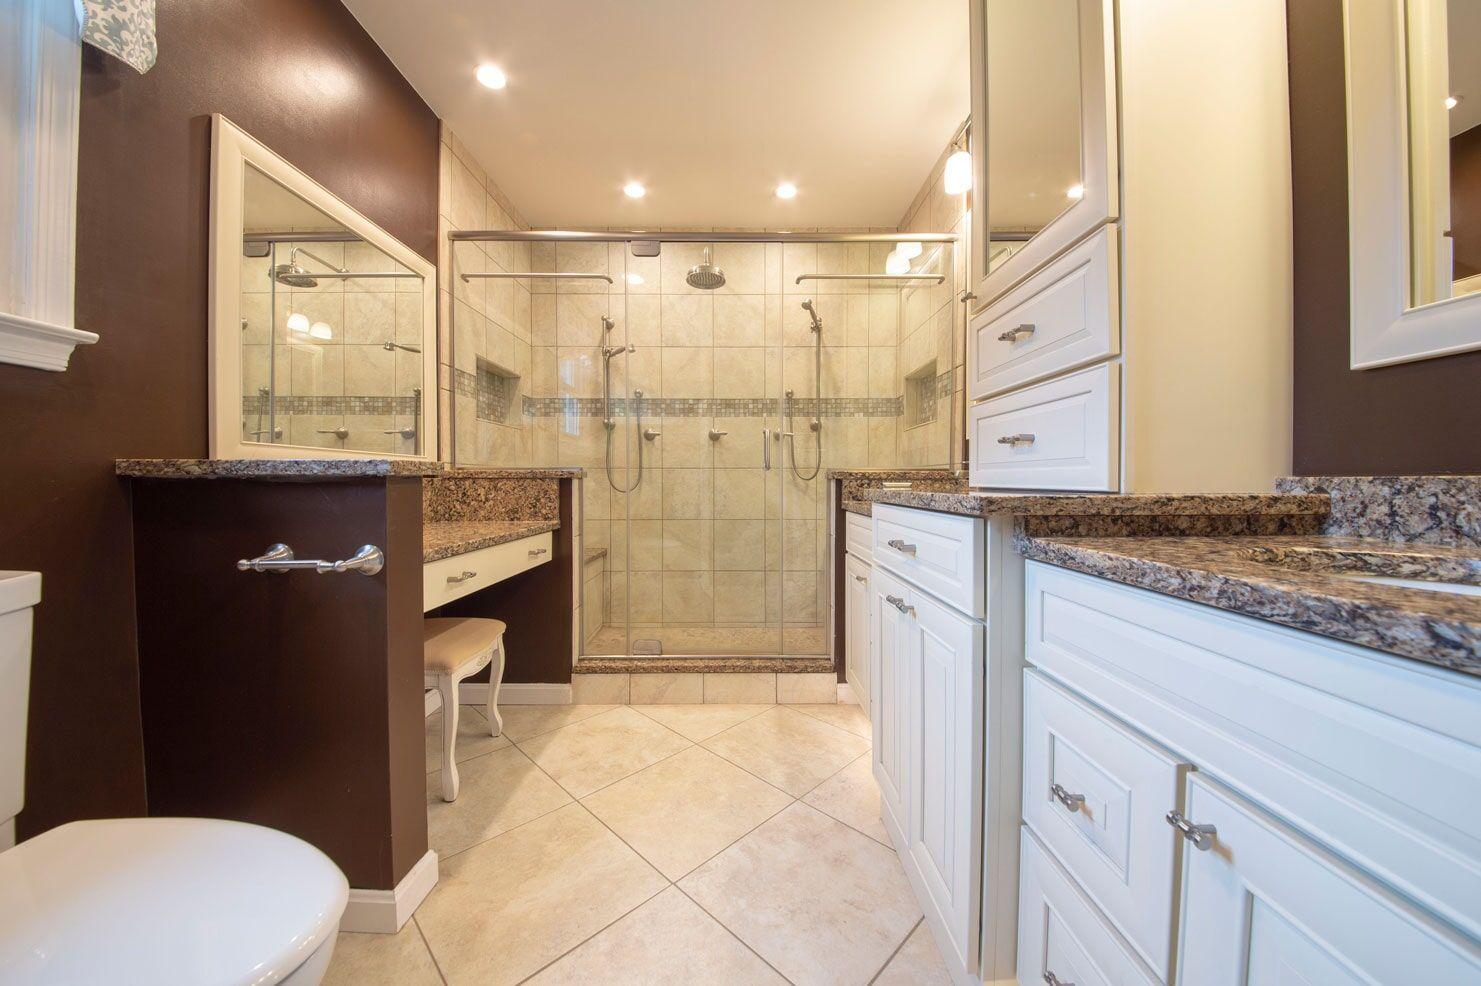 Bathroom Remodeling In Leonardtown Md By Southern Maryland Kitchen Bath Floors Design Floor Design Bathrooms Remodel Remodel [ jpg ]